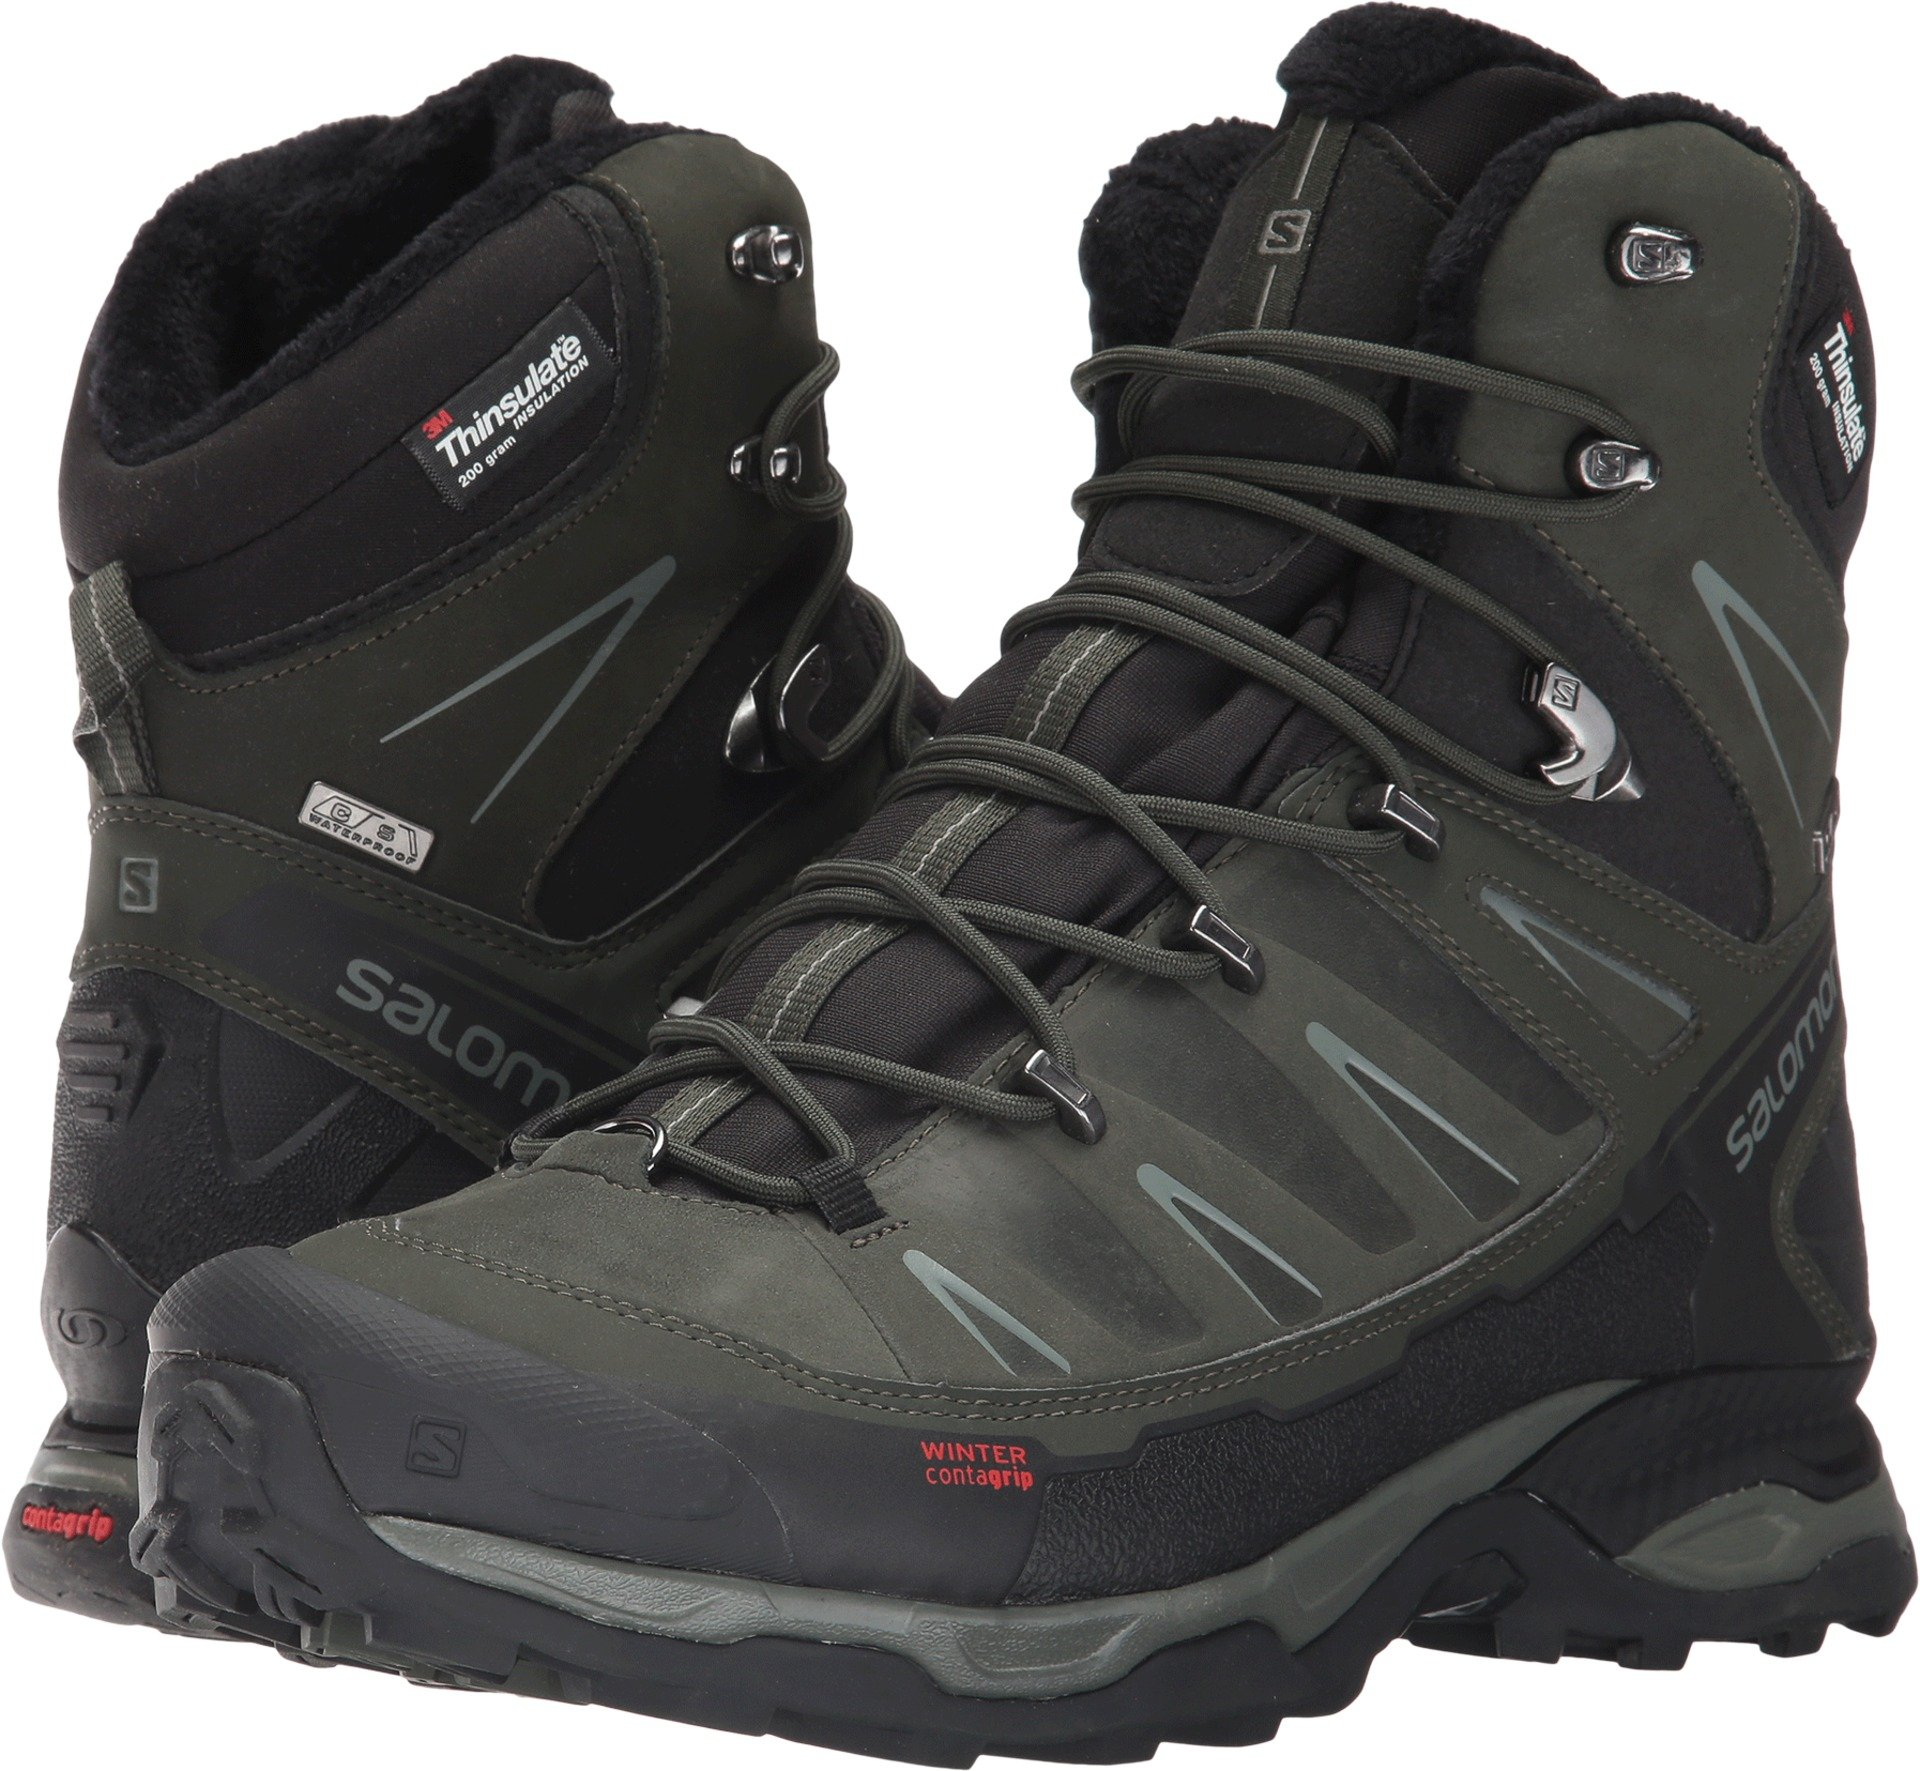 Salomon Men's X Ultra Winter CS Waterproof Snow Boot, Black/Rosin/Castor Gray, 11 M US